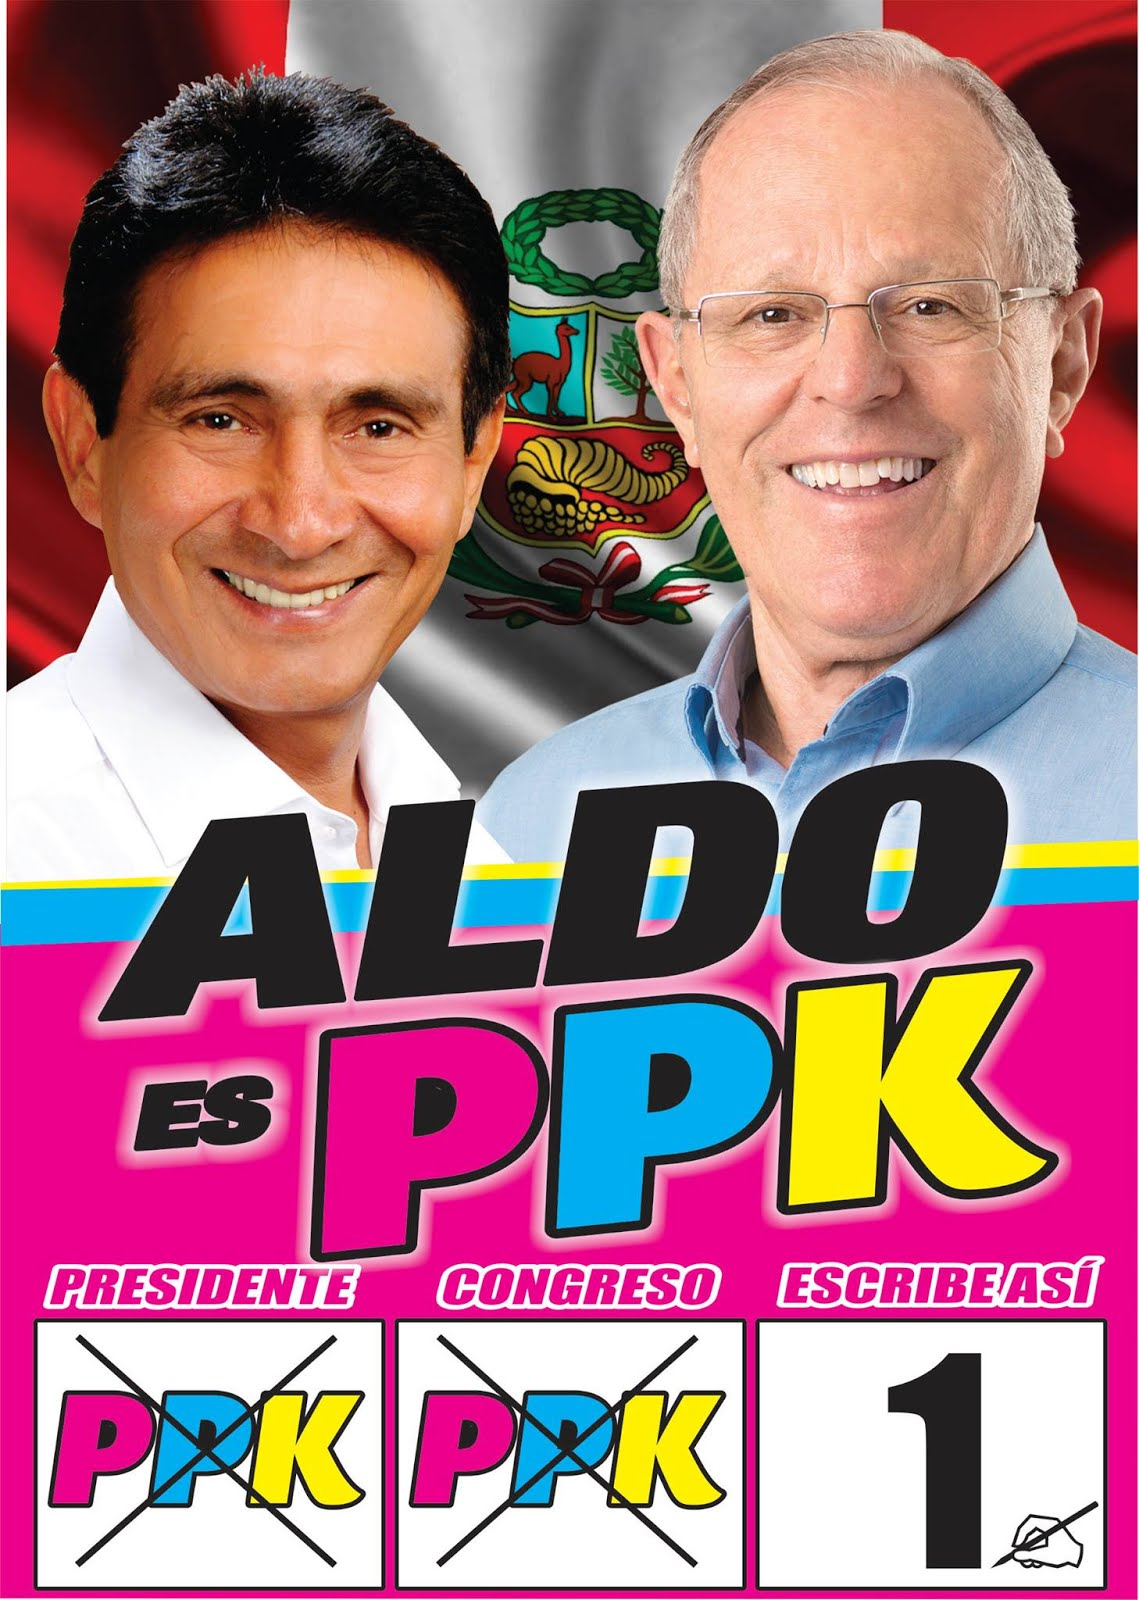 AVISO POLÍTICO CONTRATADO 3